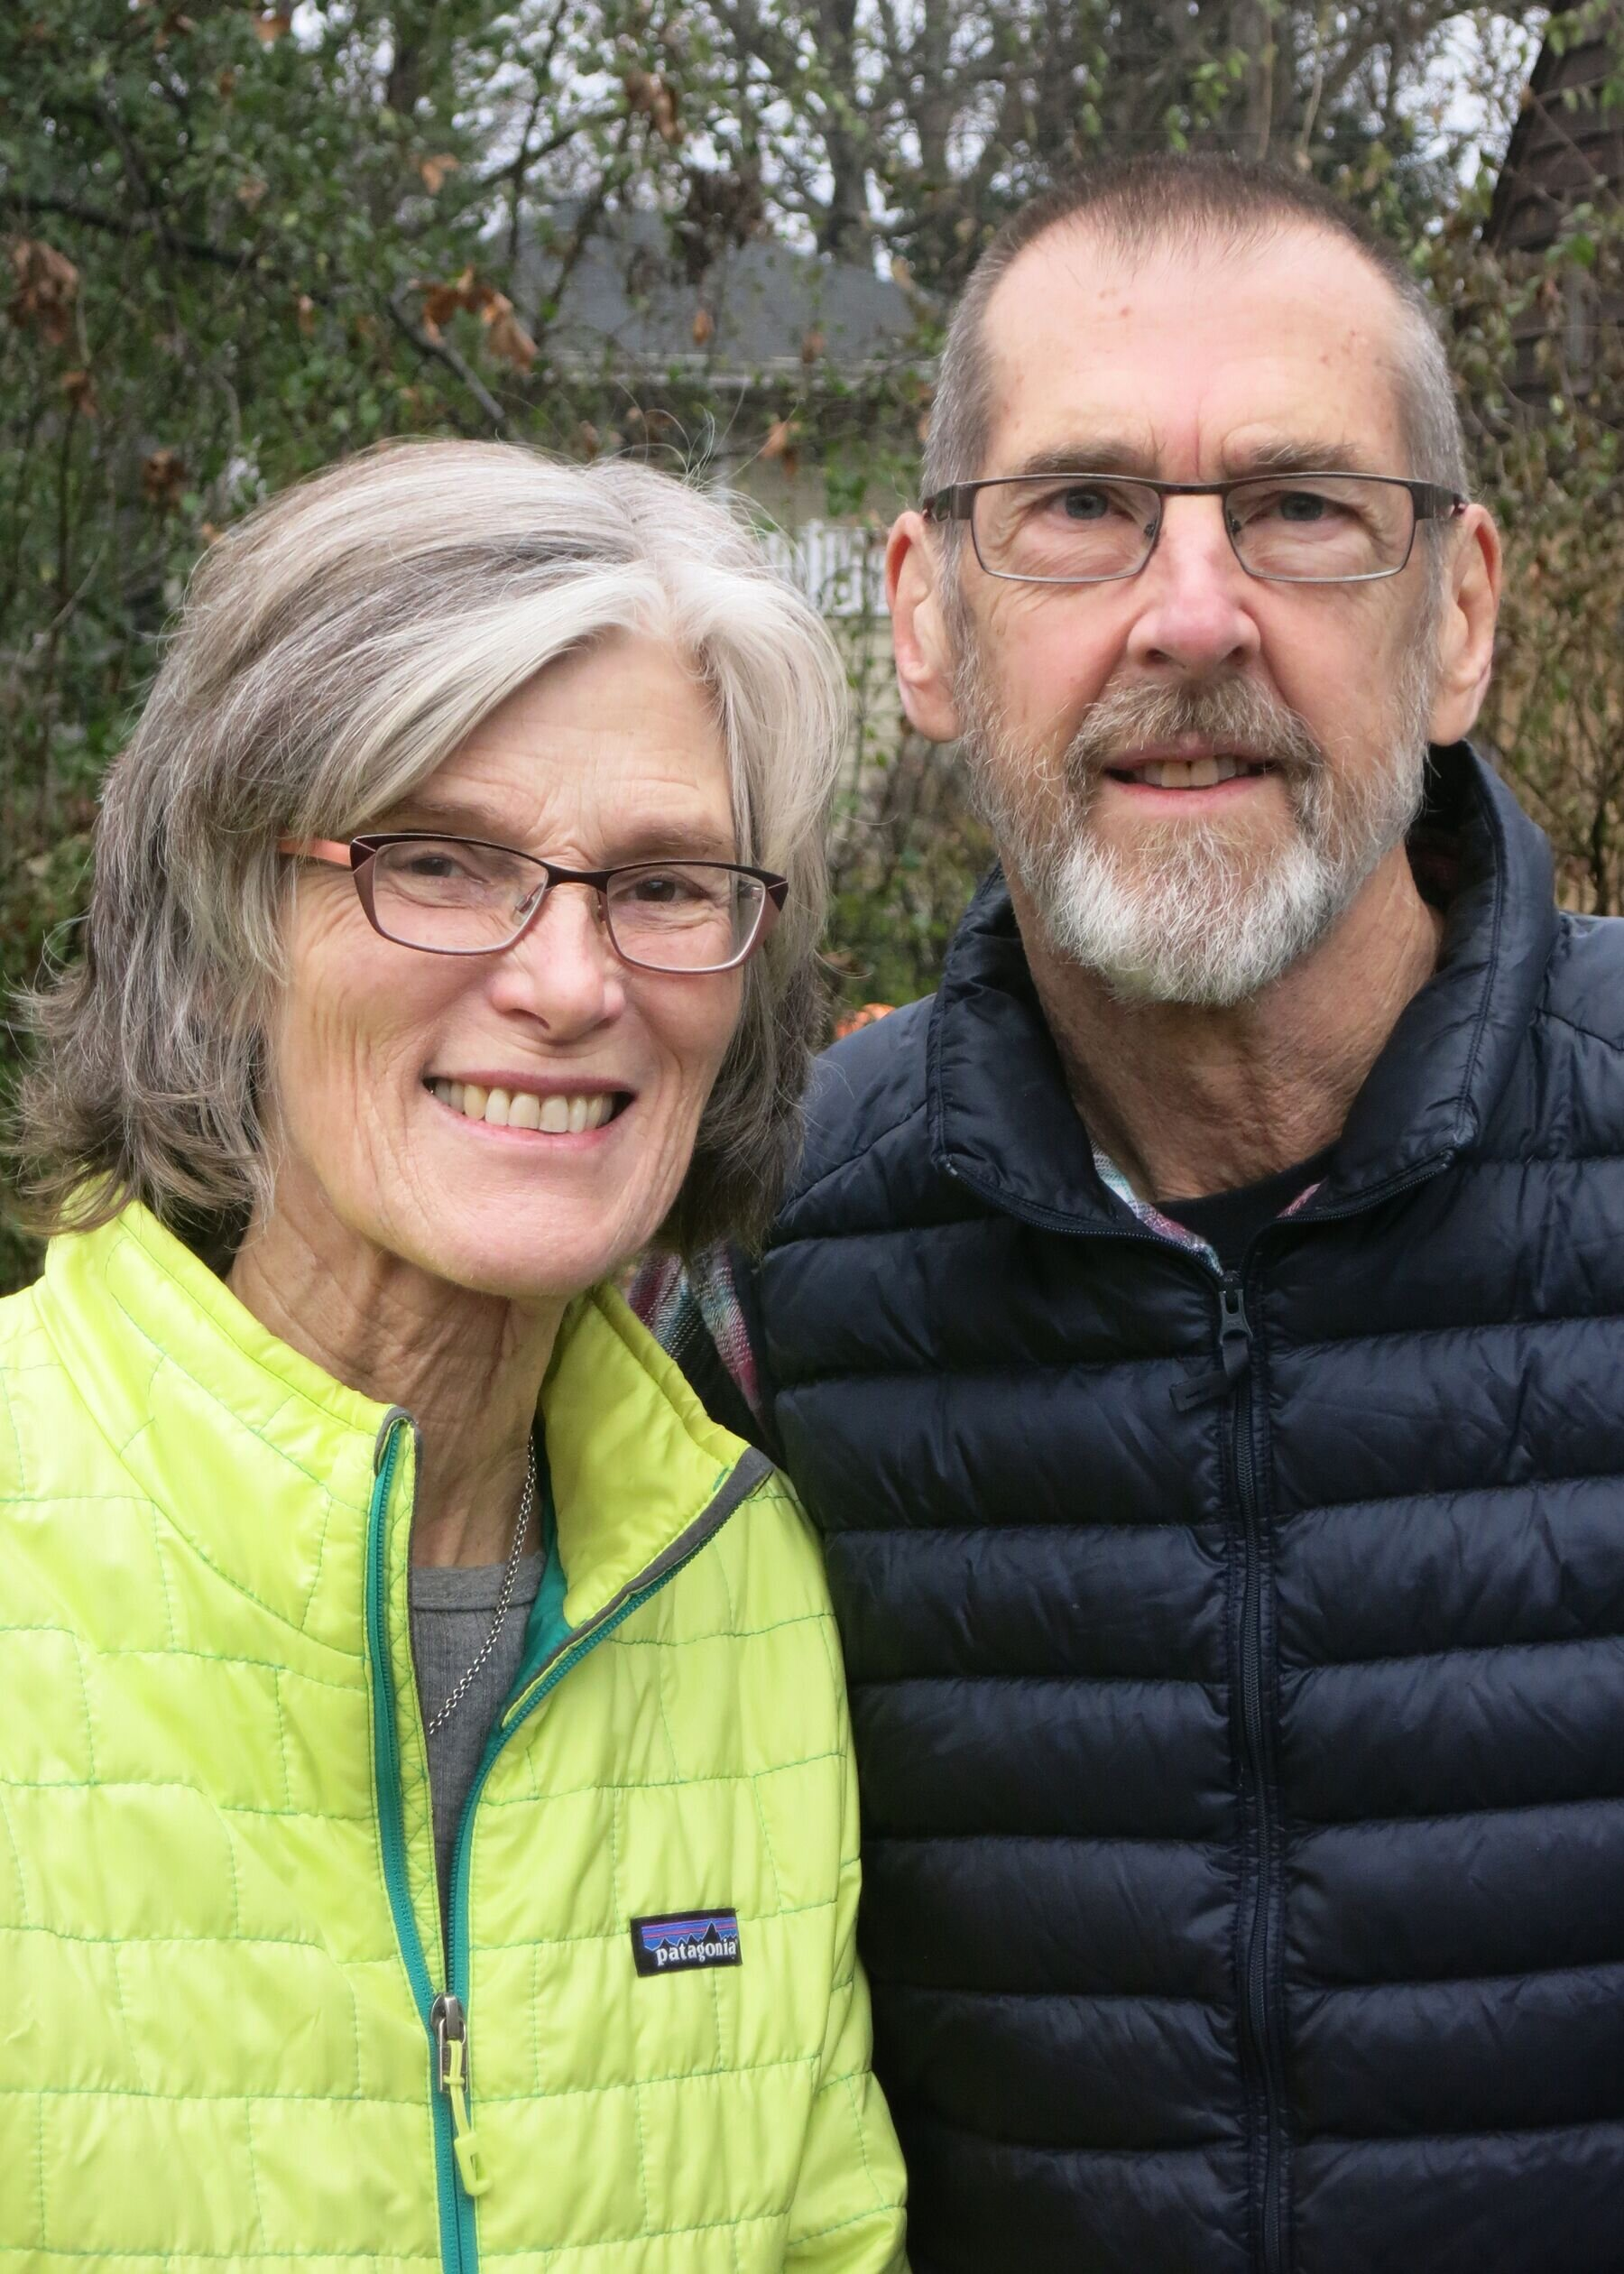 Kristine Samuelson and John Haptas